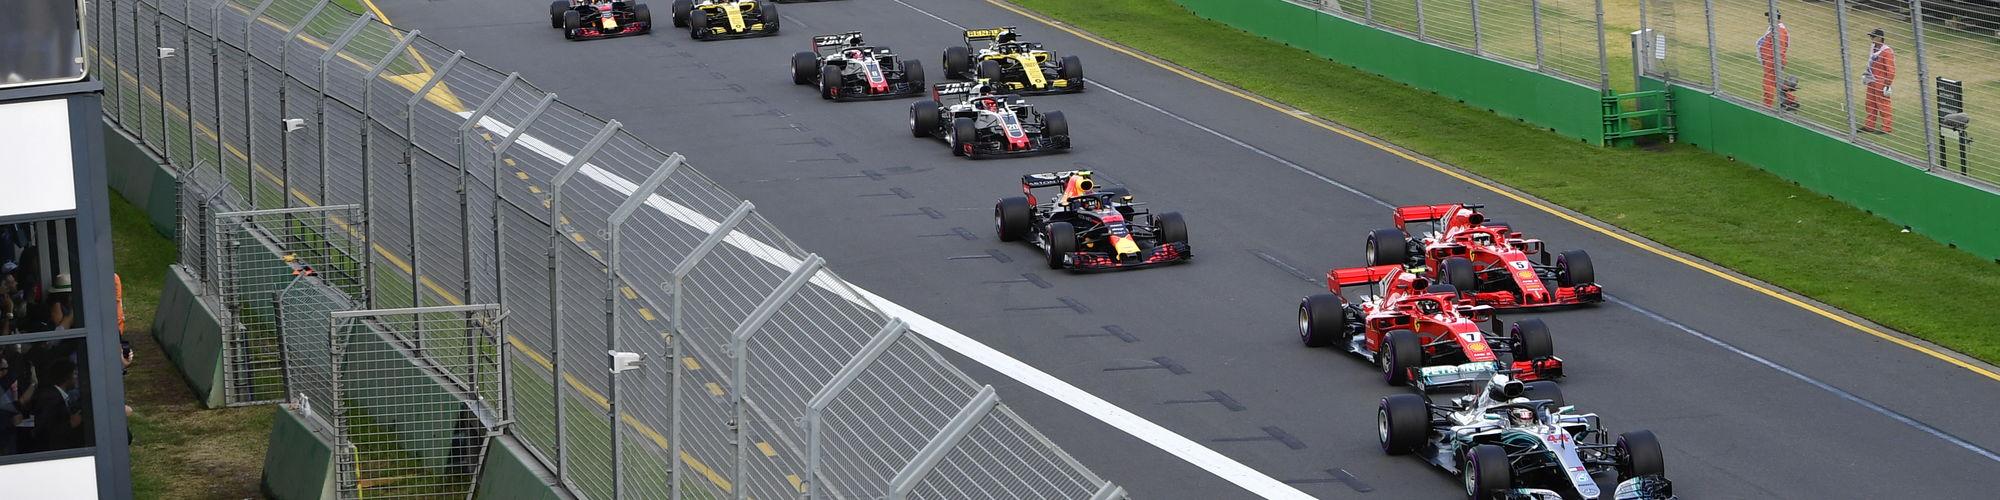 Autosport Media UK Ltd